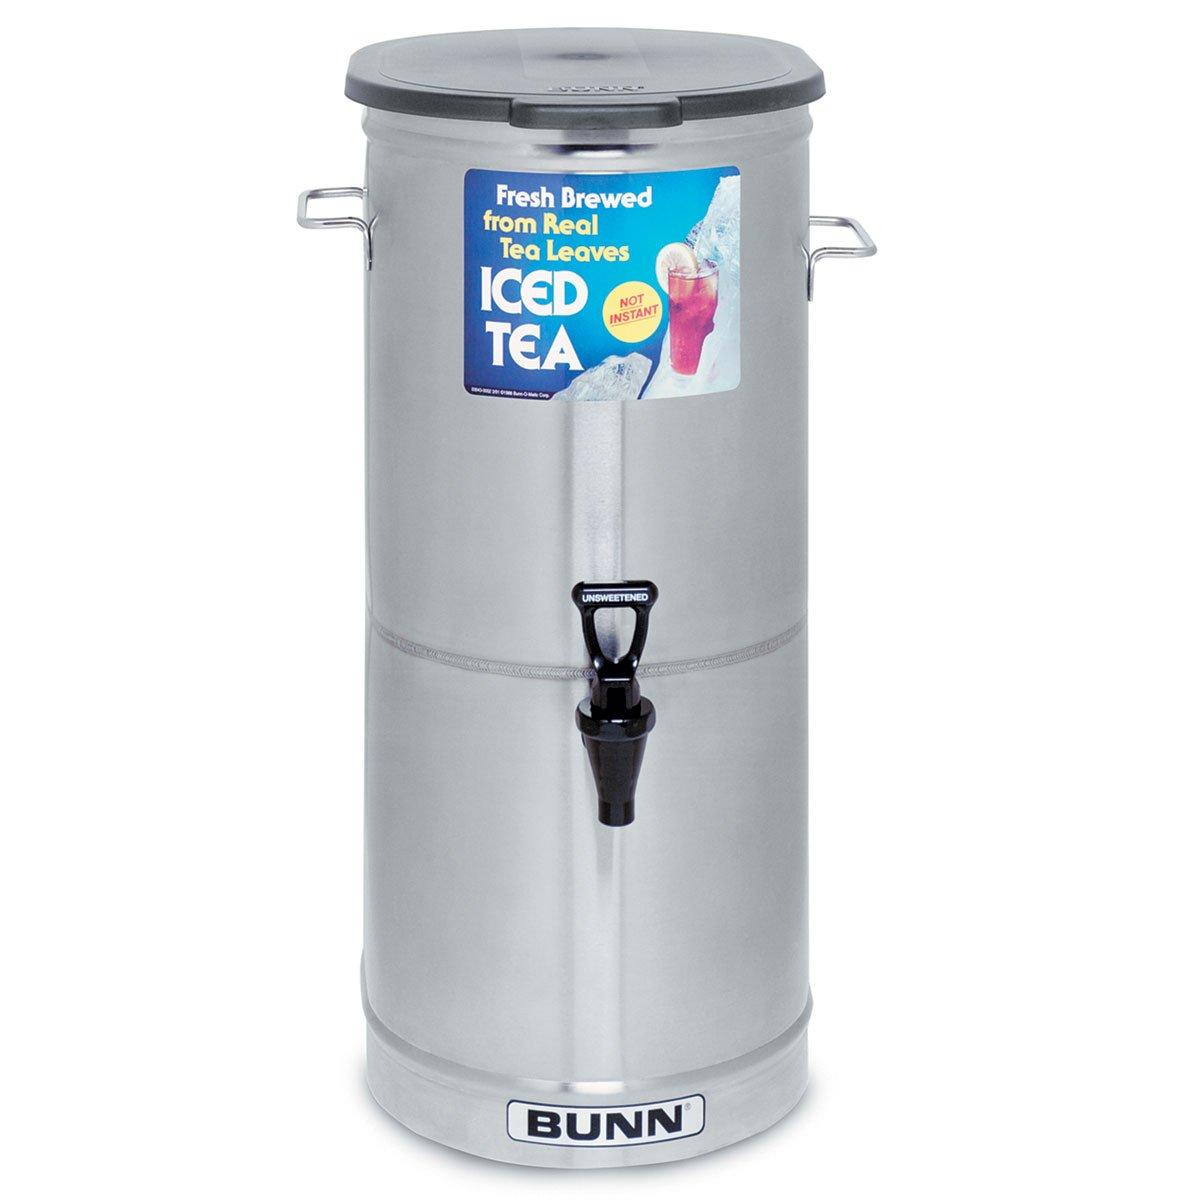 Bunn Ice Tea Dispenser Tdo-5 - 5 Gallon - Solid Lid - 34100-0001